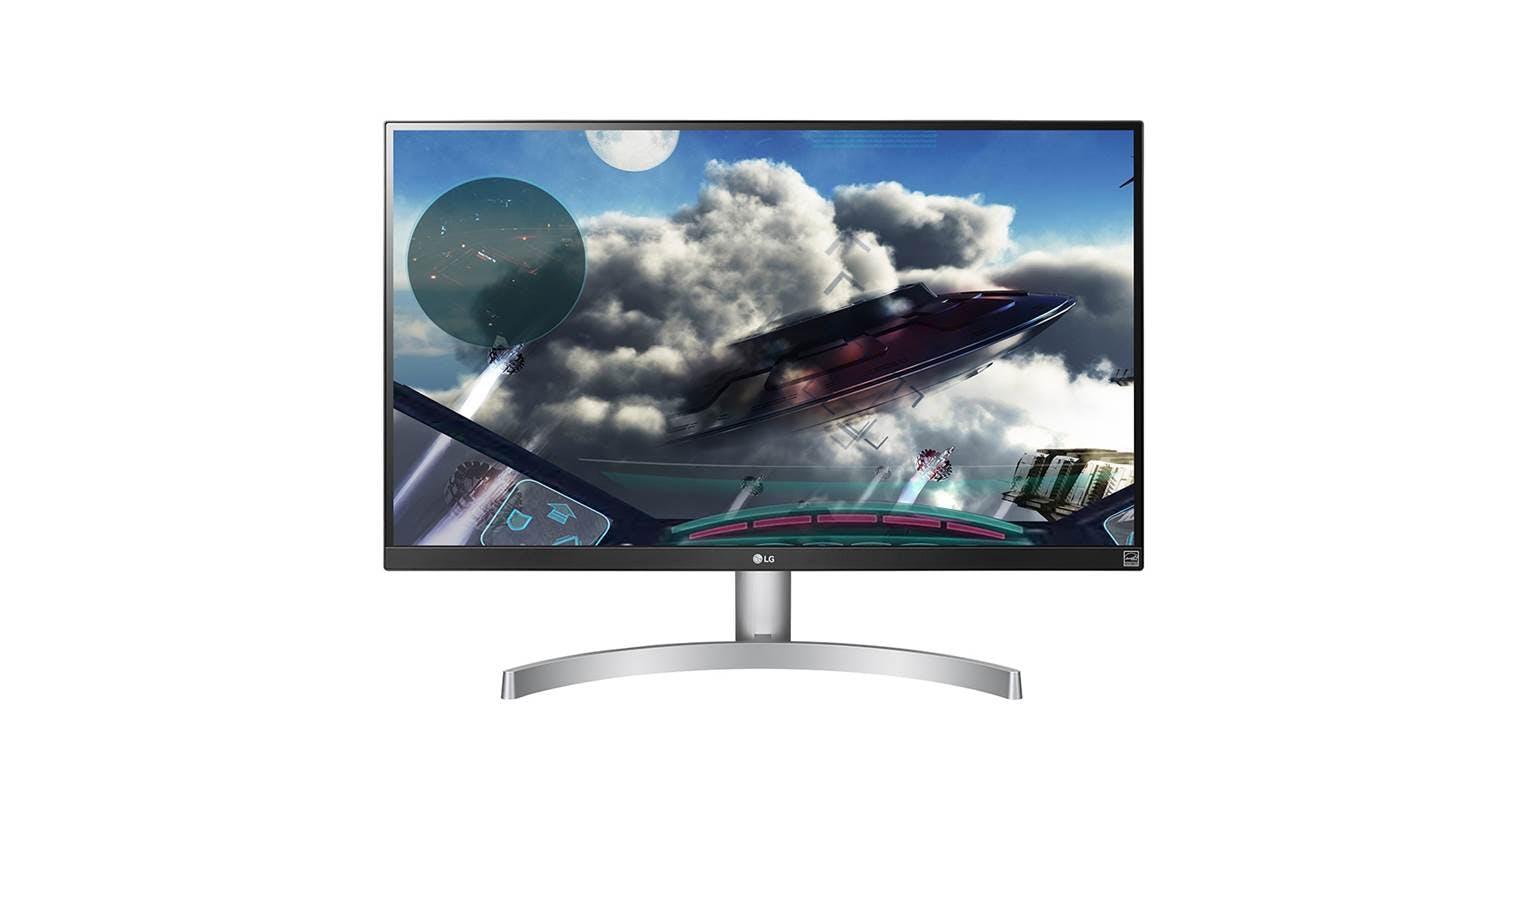 LG 27UK600 4K UHD IPS Monitor